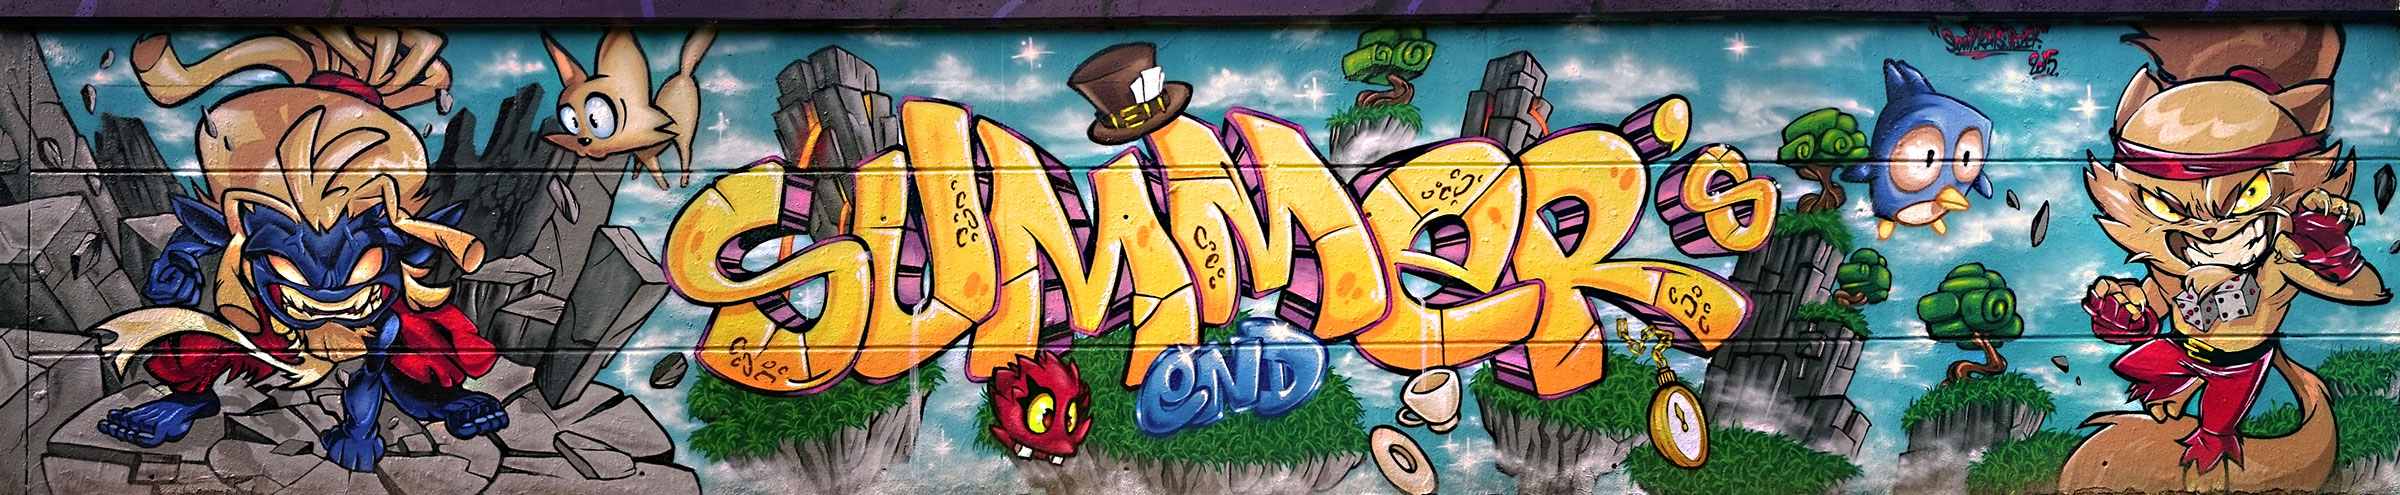 graffiti crossmaster